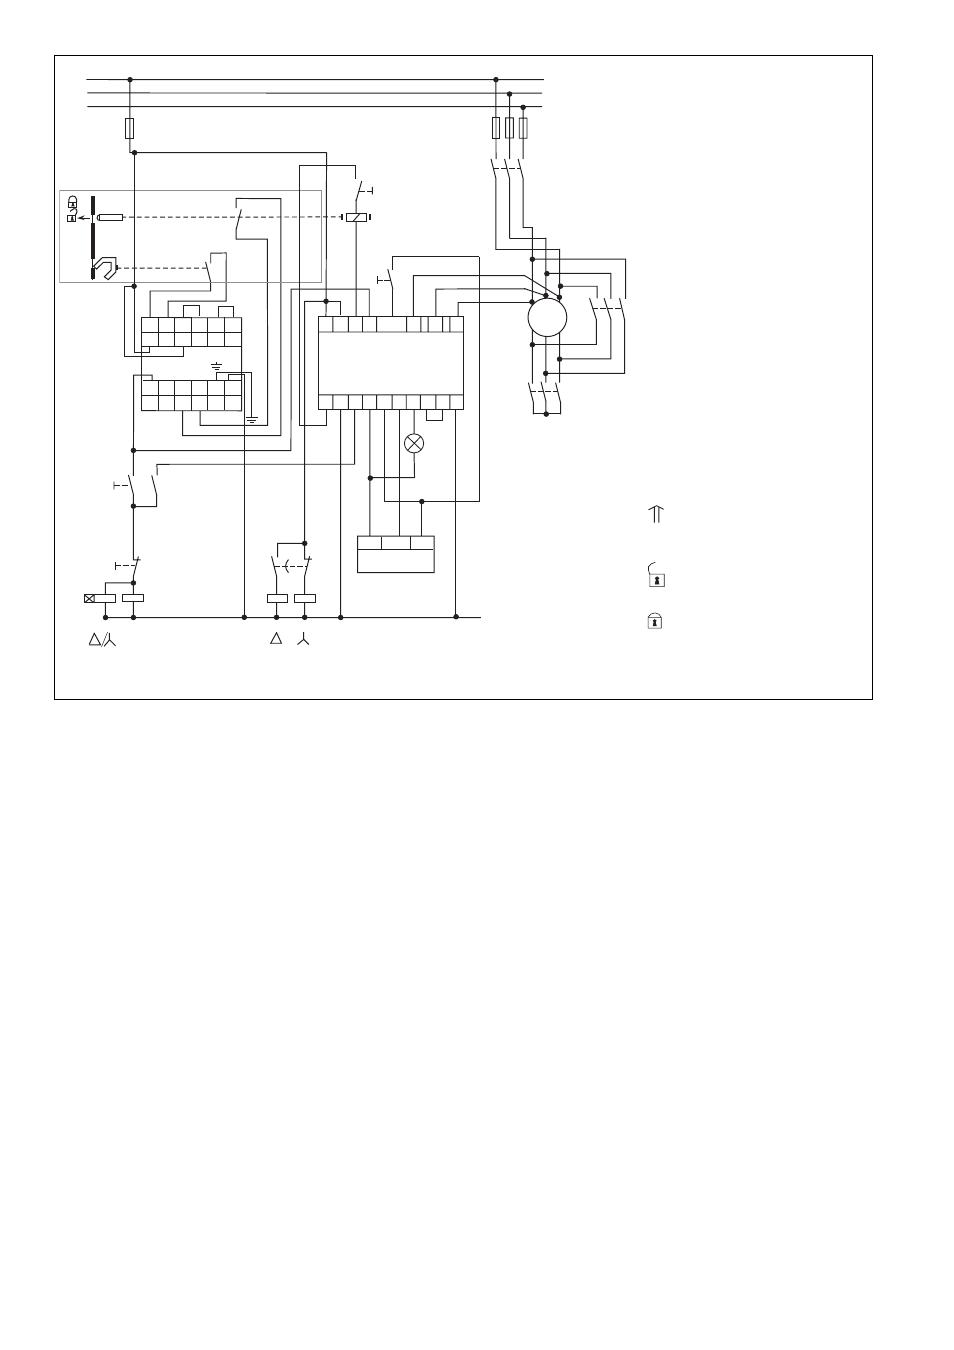 Pilz PSWZ X1P 0,5V /24-240VACDC 2n/o 1n/c 2so User Manual